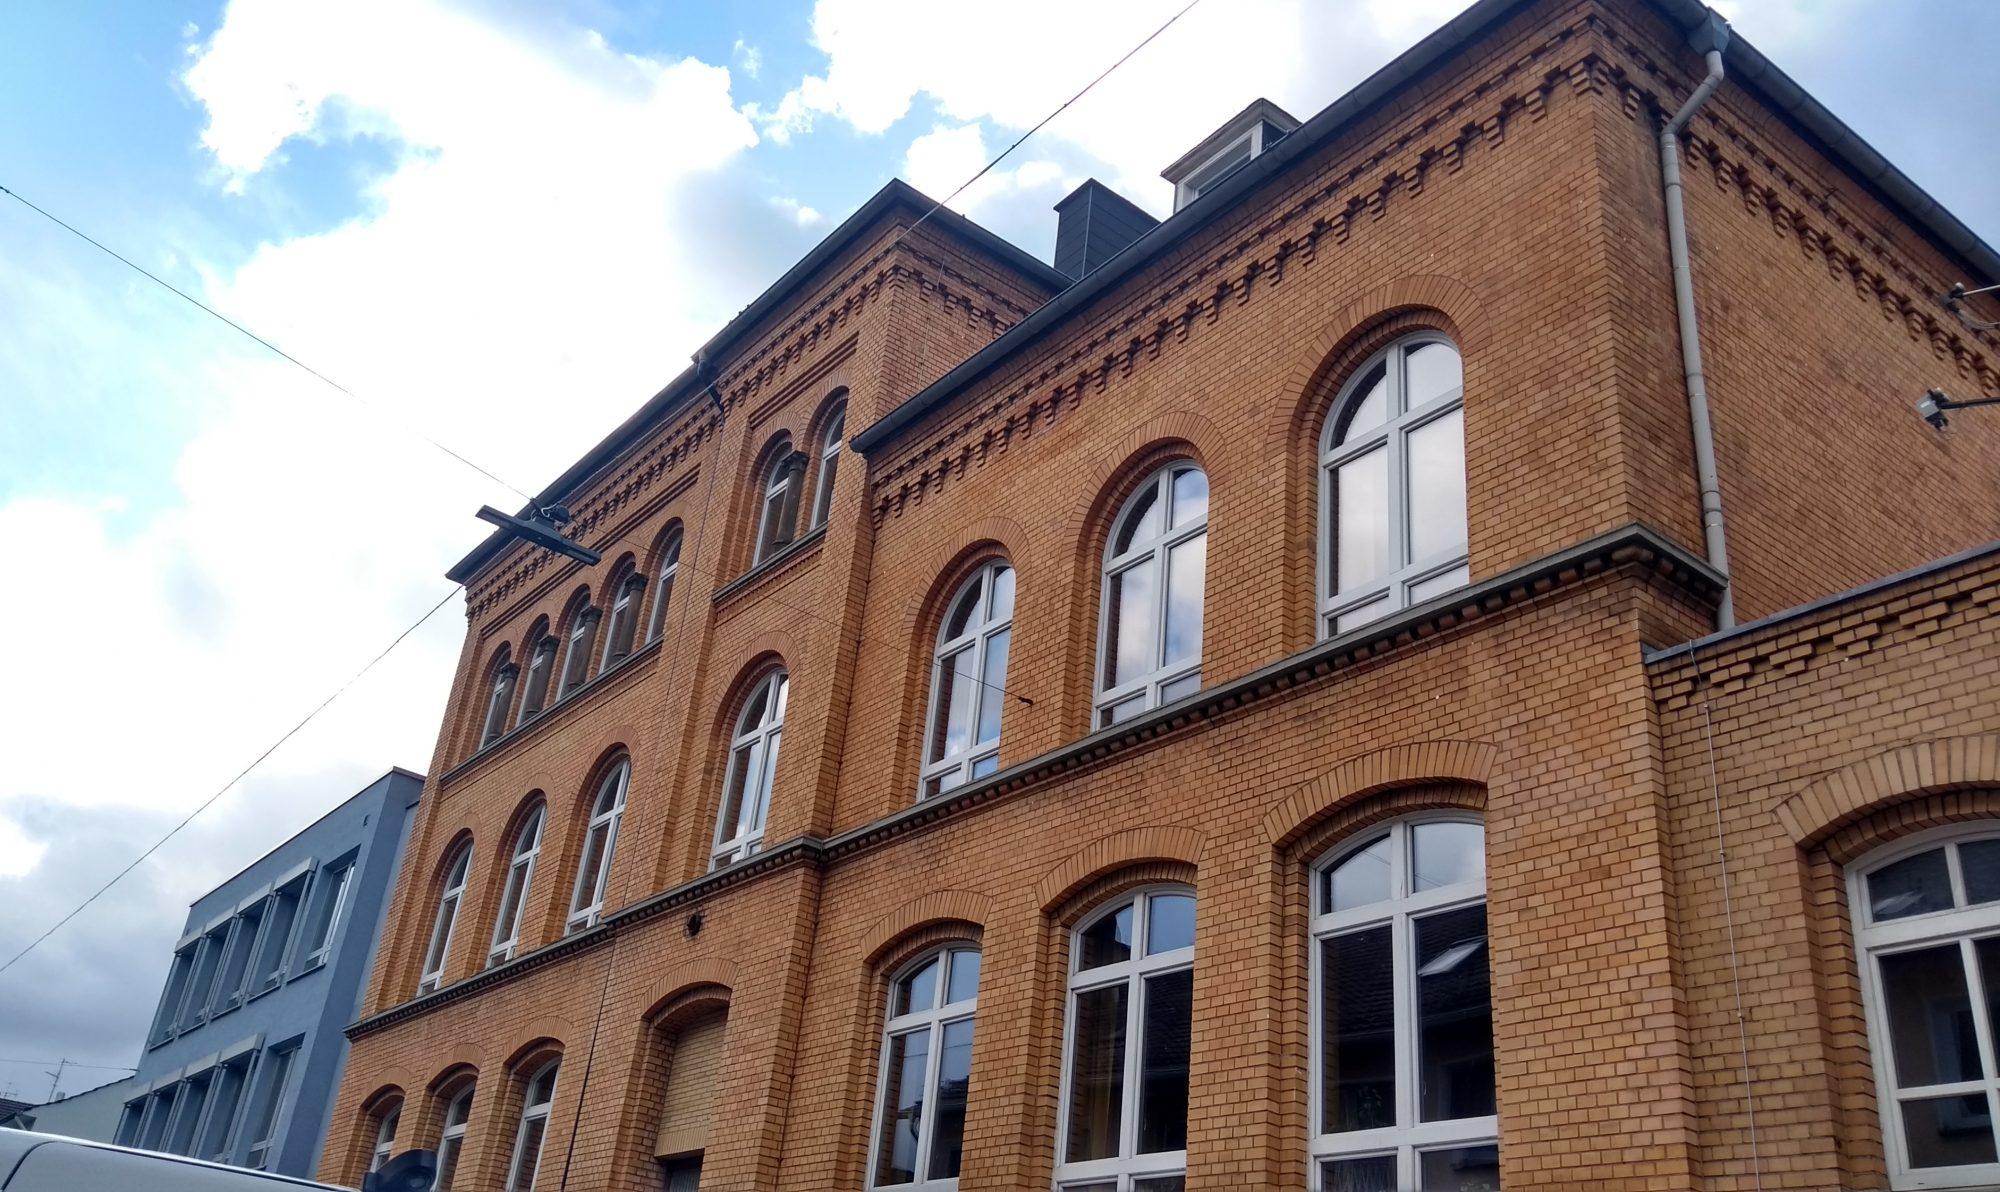 Bernhard-Letterhaus-Schule